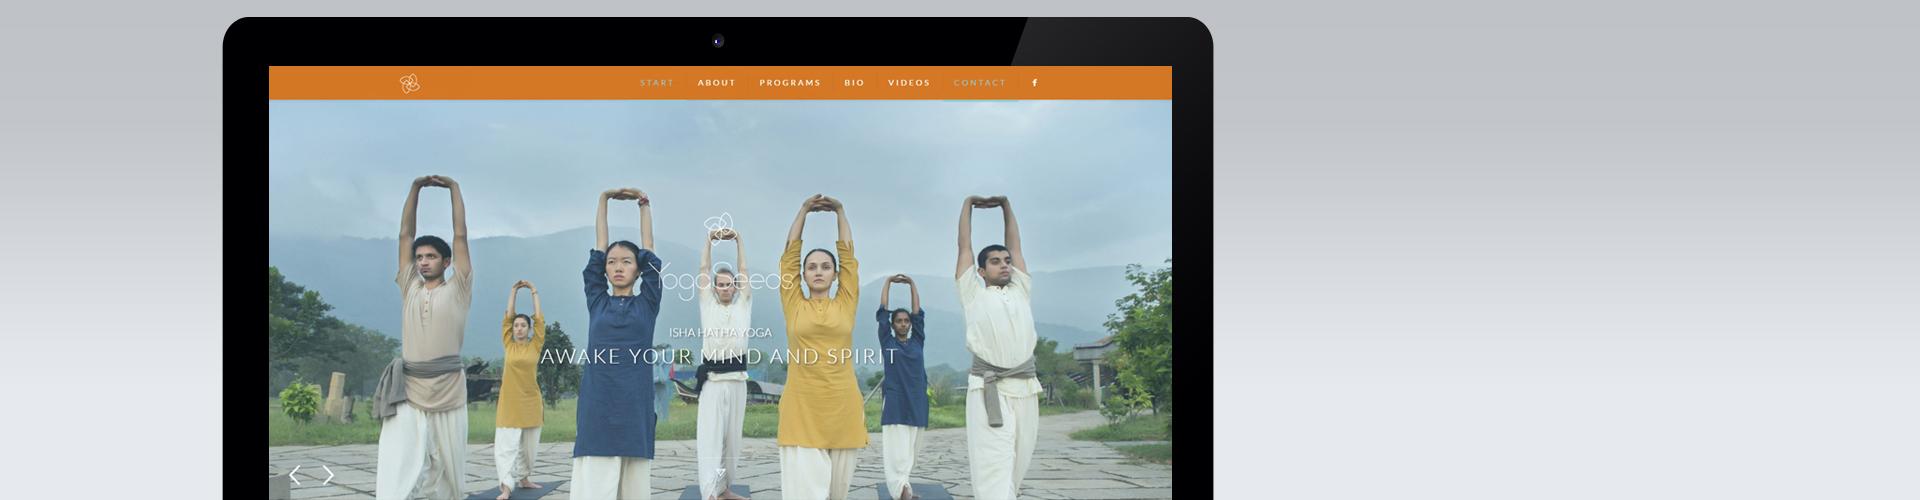 yogaseeds_web header